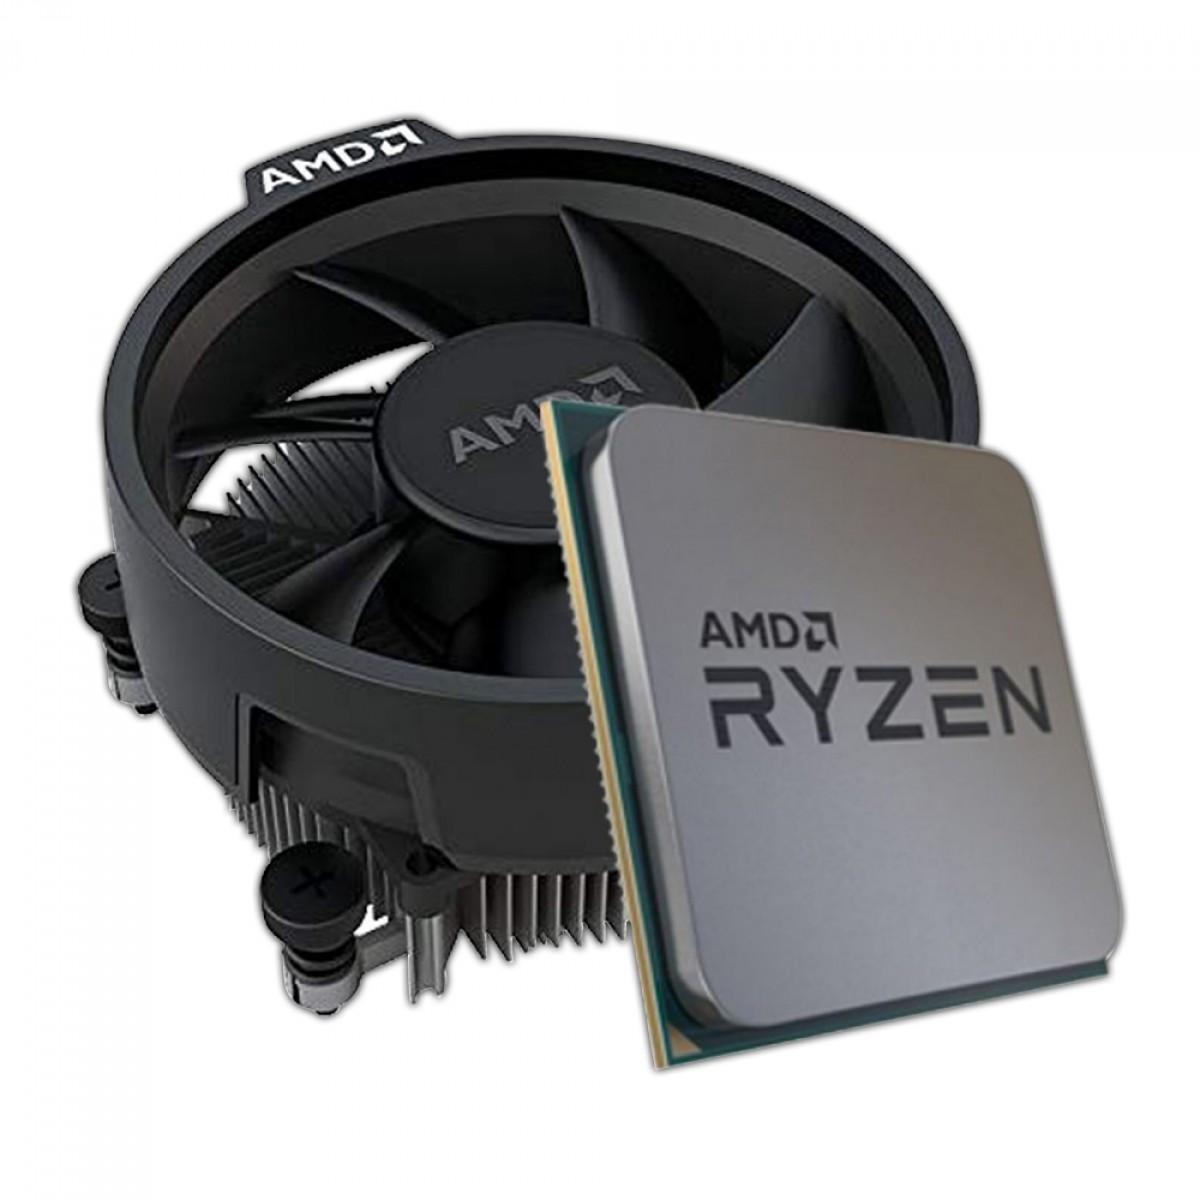 Kit Upgrade Biostar A320MH AMD AM4 + Ryzen 5 3400G 3.7GHz + Geil Evo Potenza DDR4 8GB 3000MHz